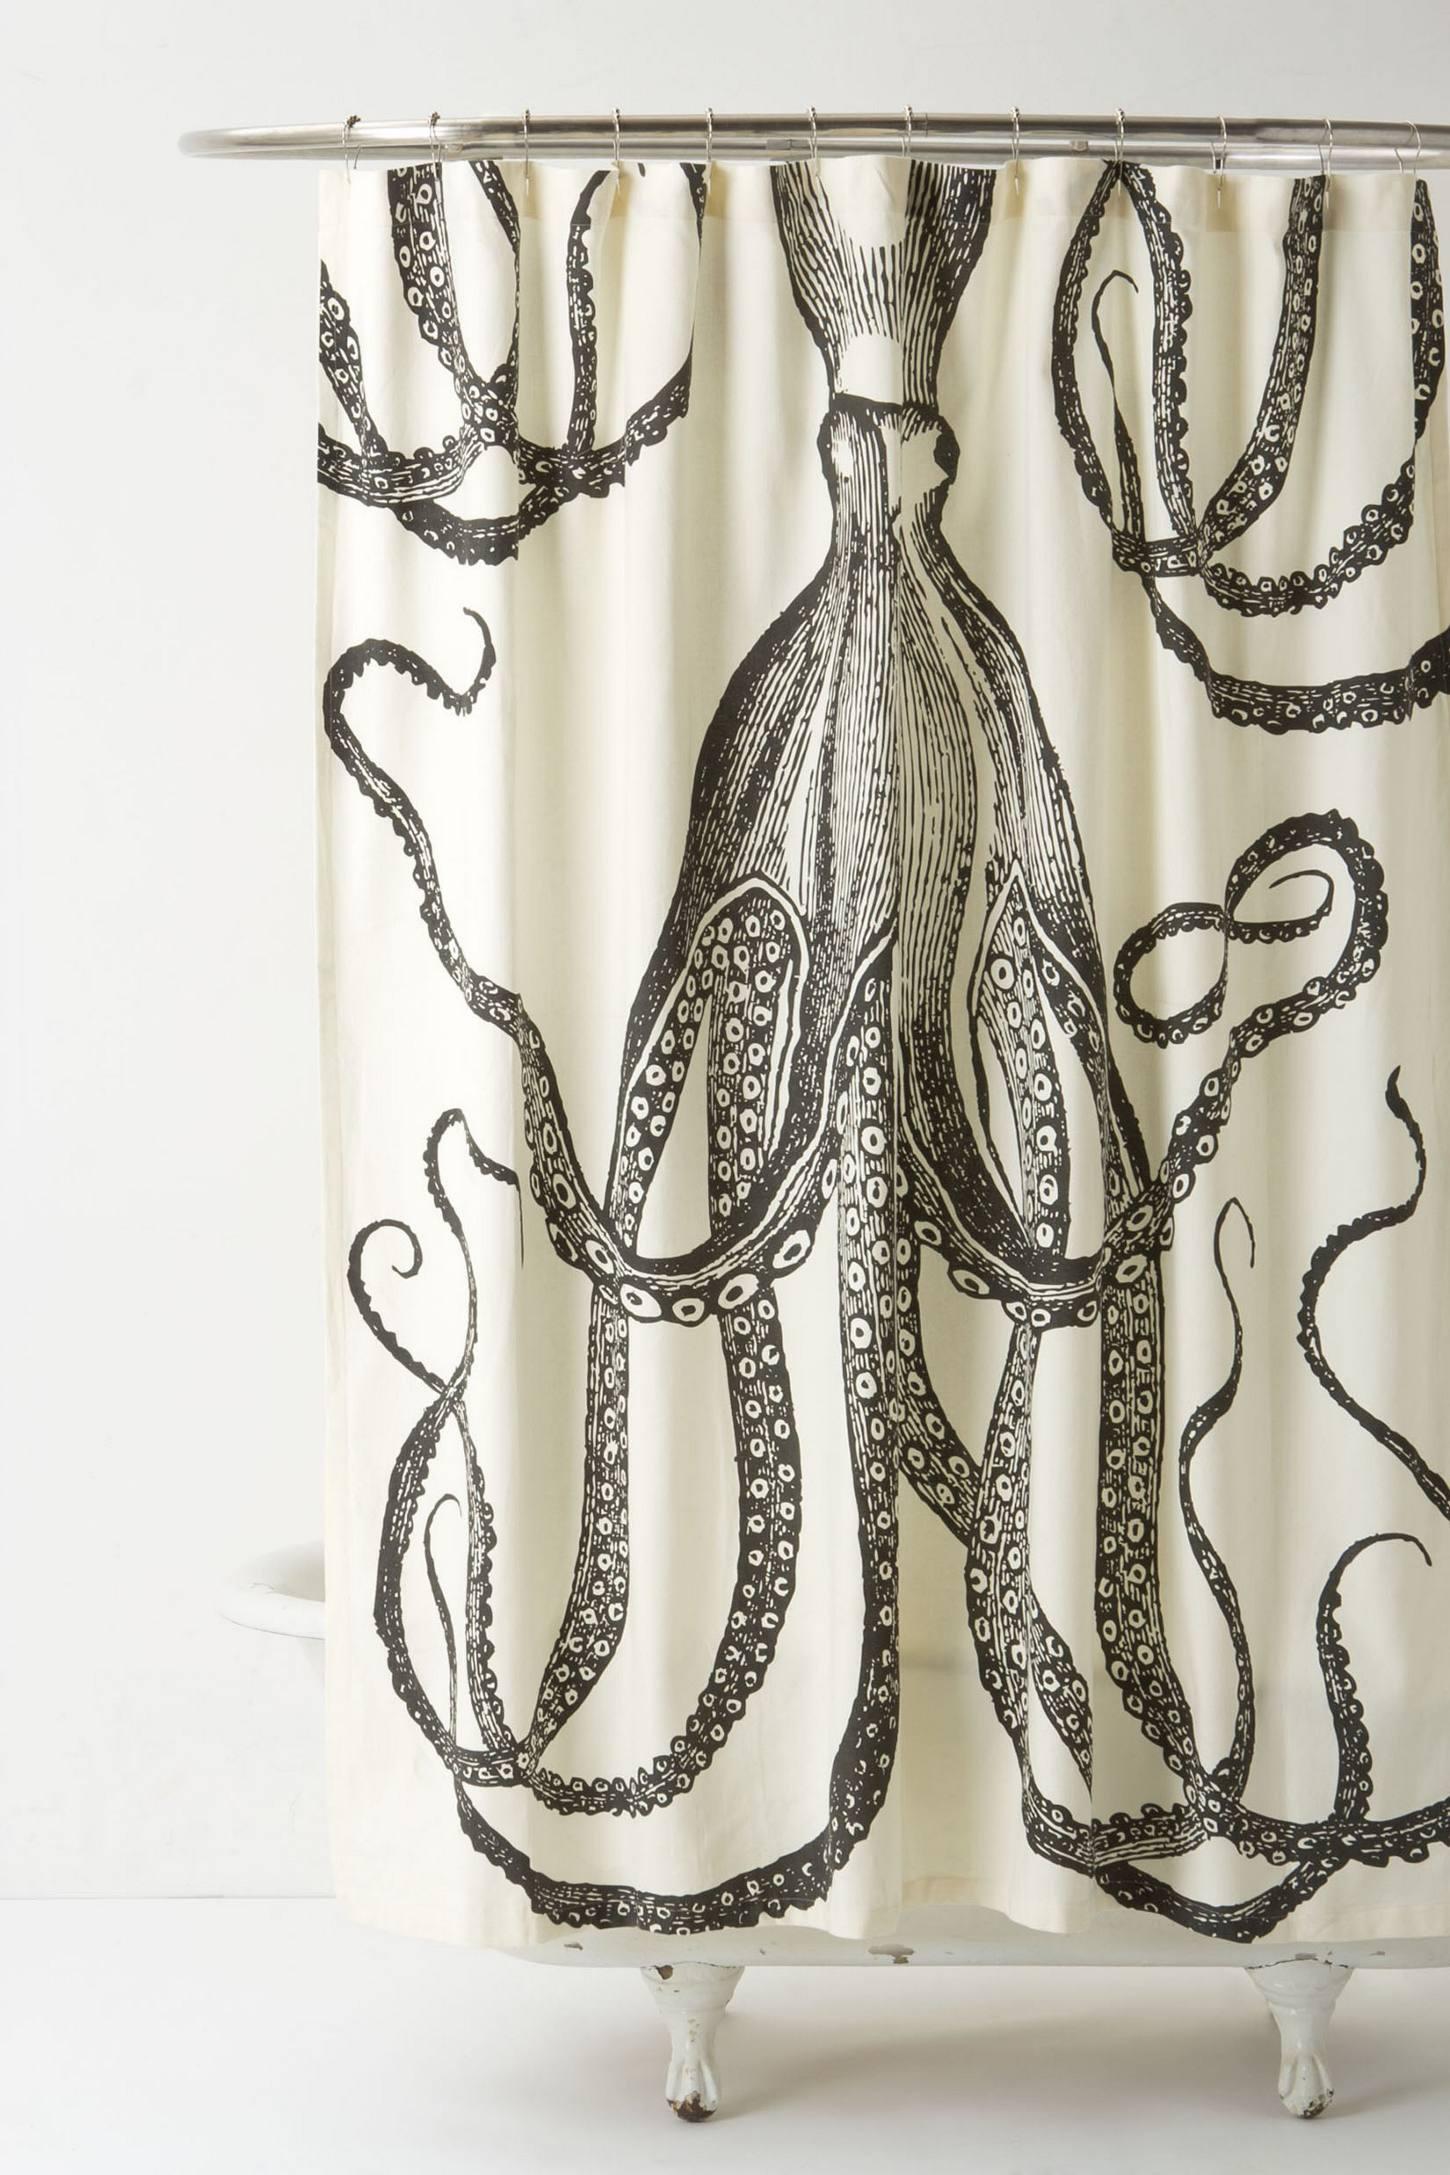 thomas paul octopus vineyard shower curtain  curtain menzilperdenet - octopus garden shower curtain anthropologie blue flax octopus vineyard showercurtain thomaspaul